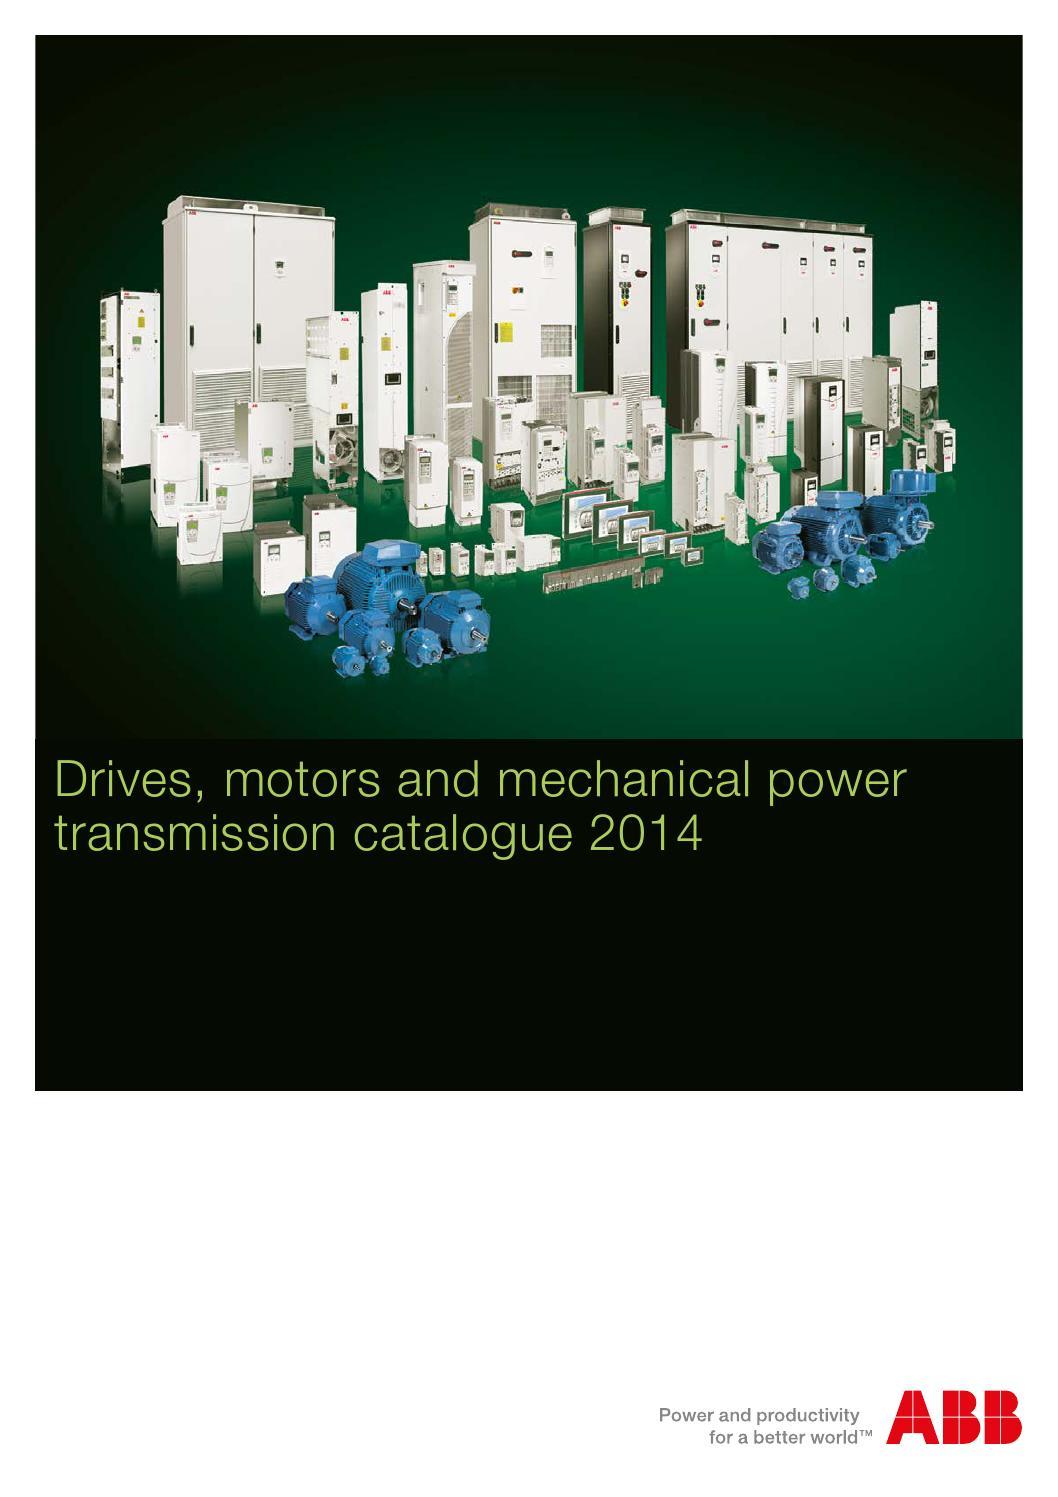 Abb Drives Motors Company Brochure 2014 By Process Industry Informer Issuu